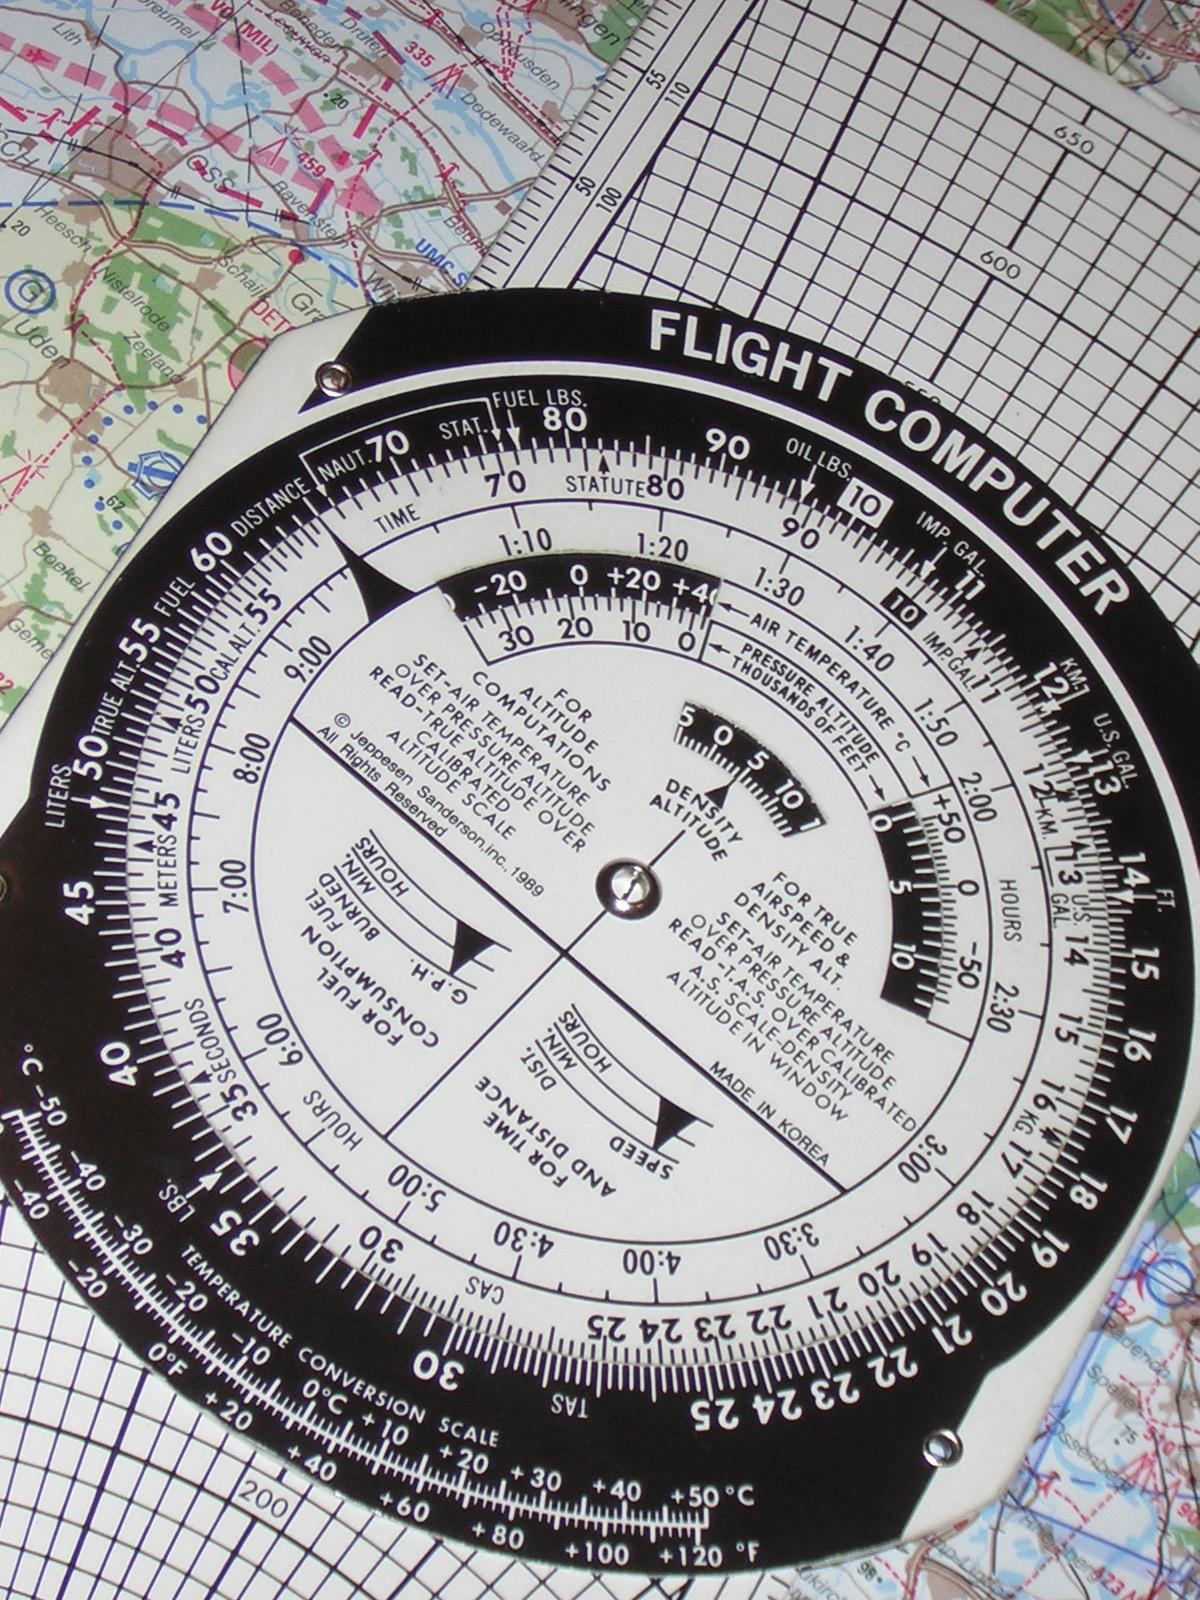 Flight computer